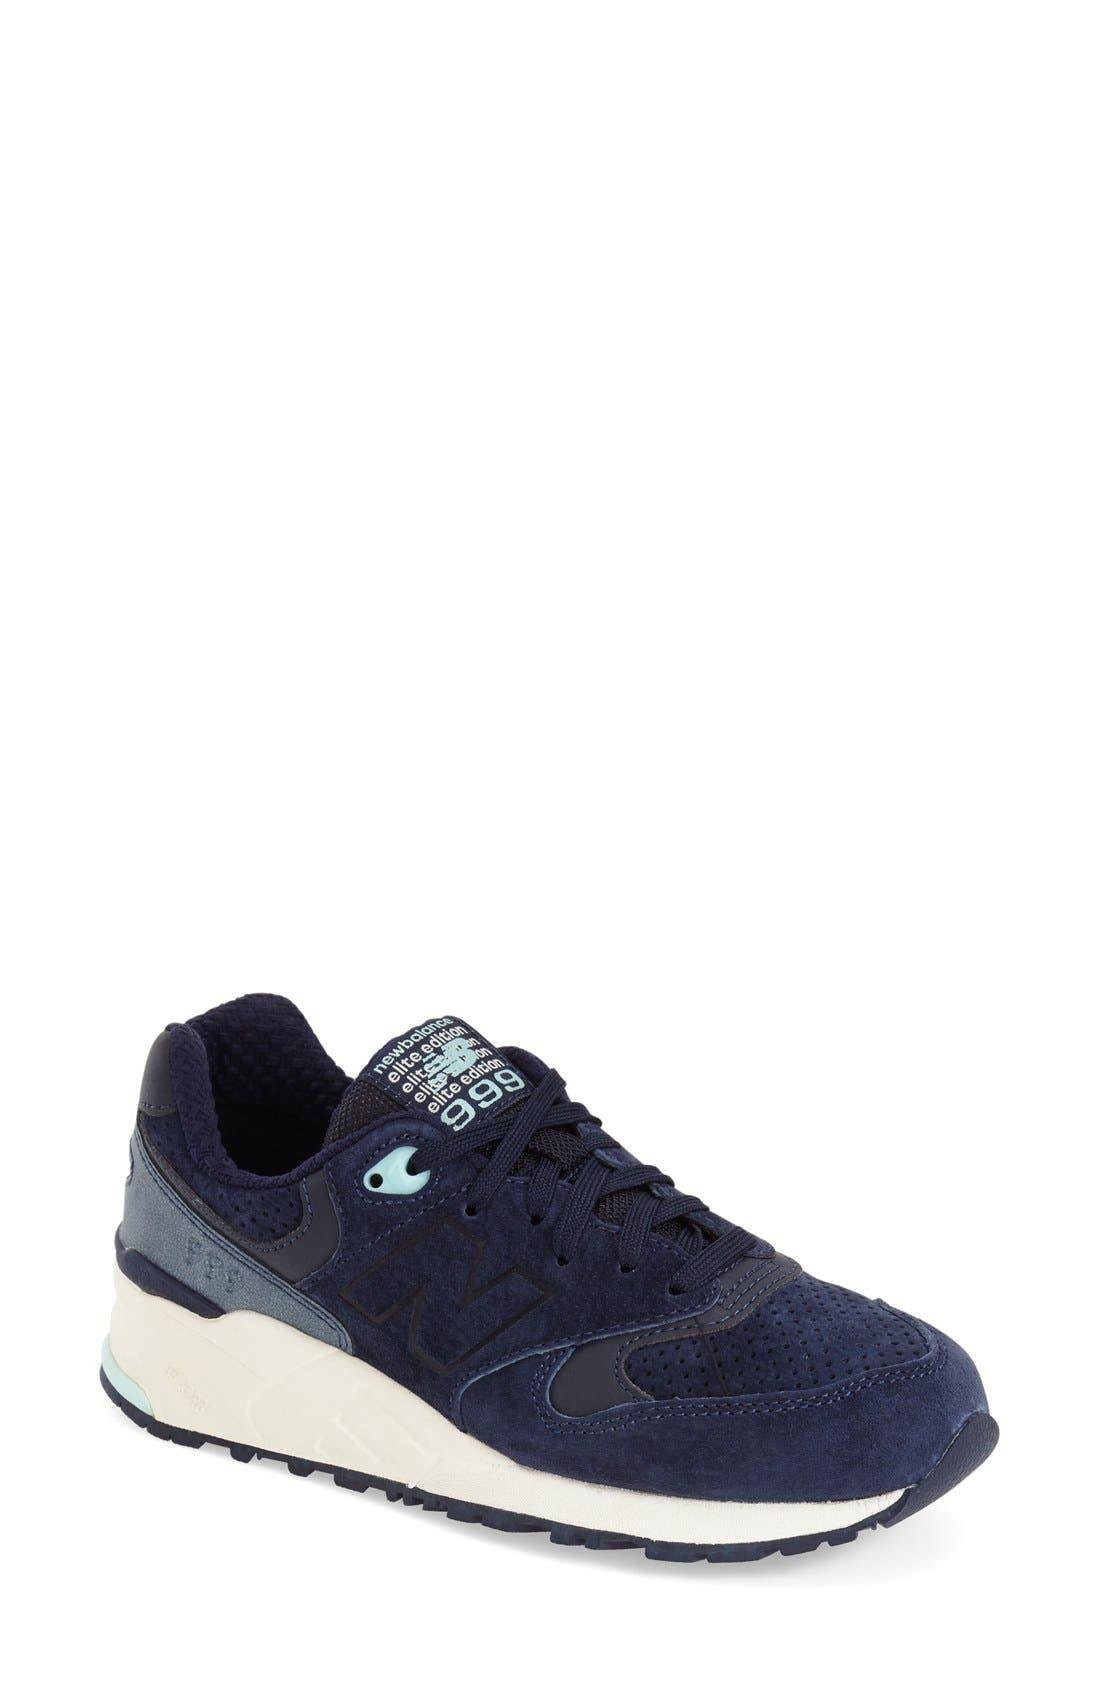 Alternate Image 1 Selected - New Balance '999' Sneaker (Women)